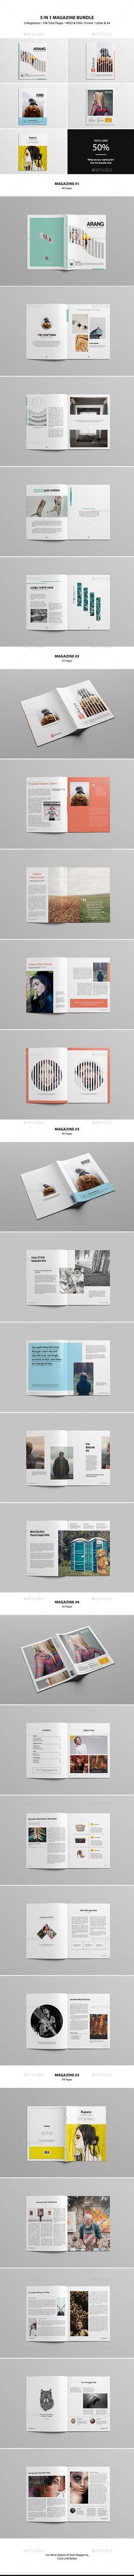 5 in 1 Magazine Bundle Templates InDesign INDD #design Download: http://graphicriver.net/item/5-in-1-magazine-bundle/13714141?ref=ksioks